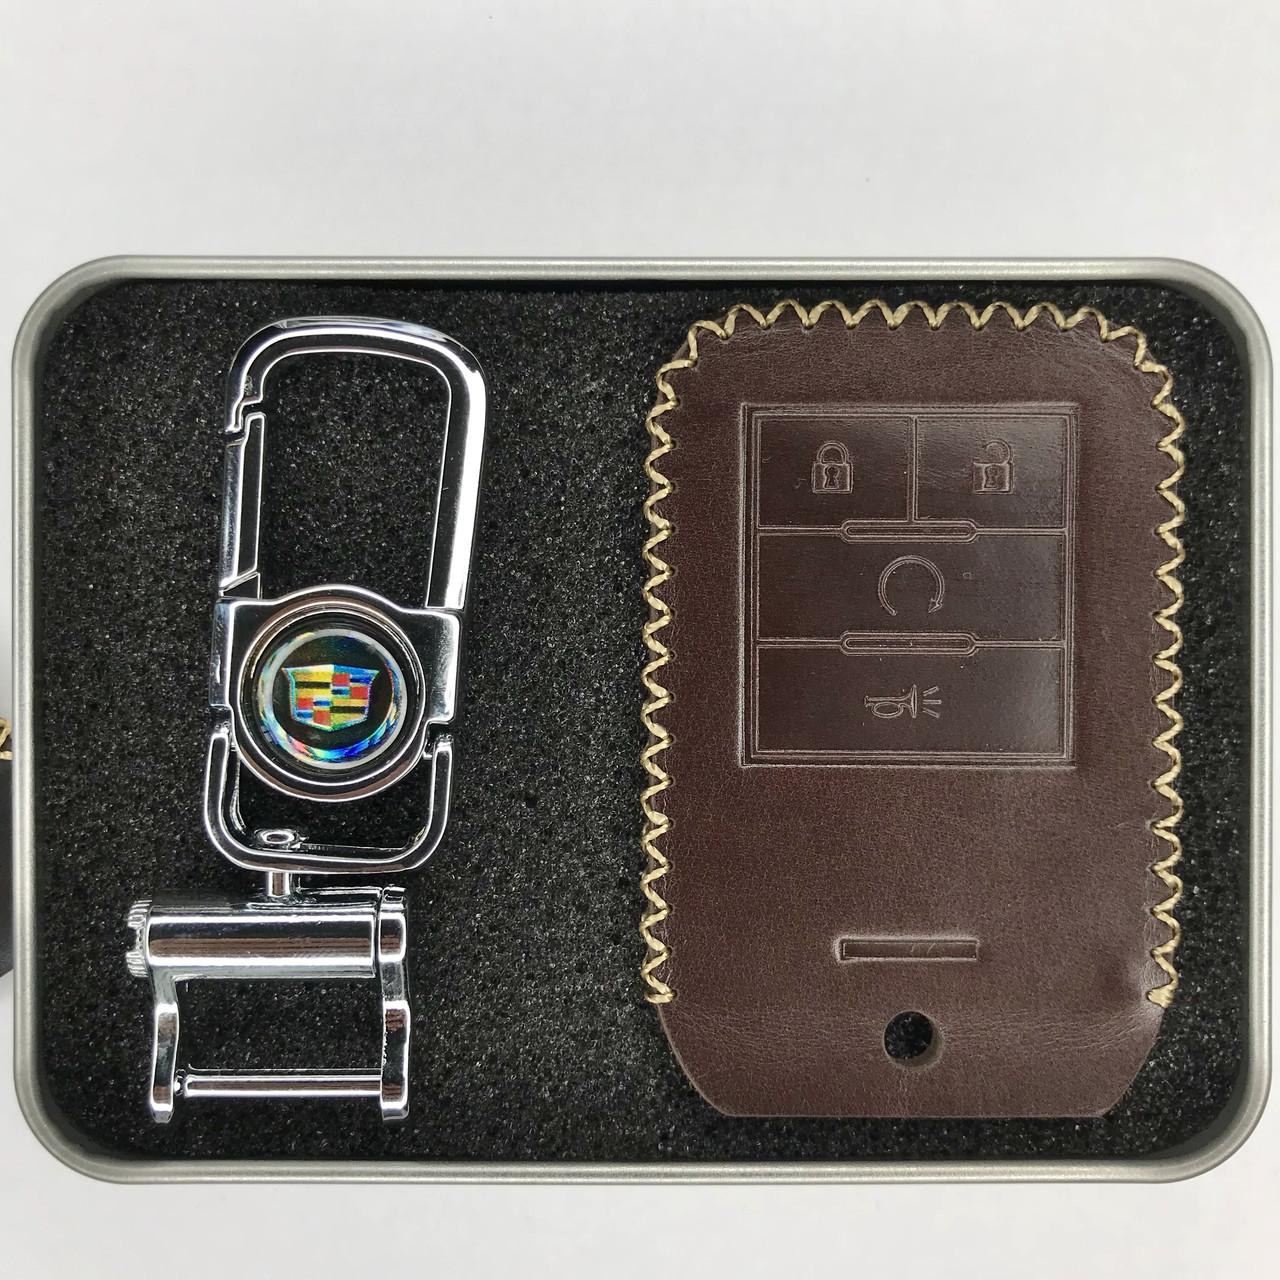 Кожаный чехол для ключа Cadillac ATS,BLS,CT6,CTS,CTS-V,DTS,ELR ,Escalade,Seville,SRX,STS,XT4,XT5,XTS